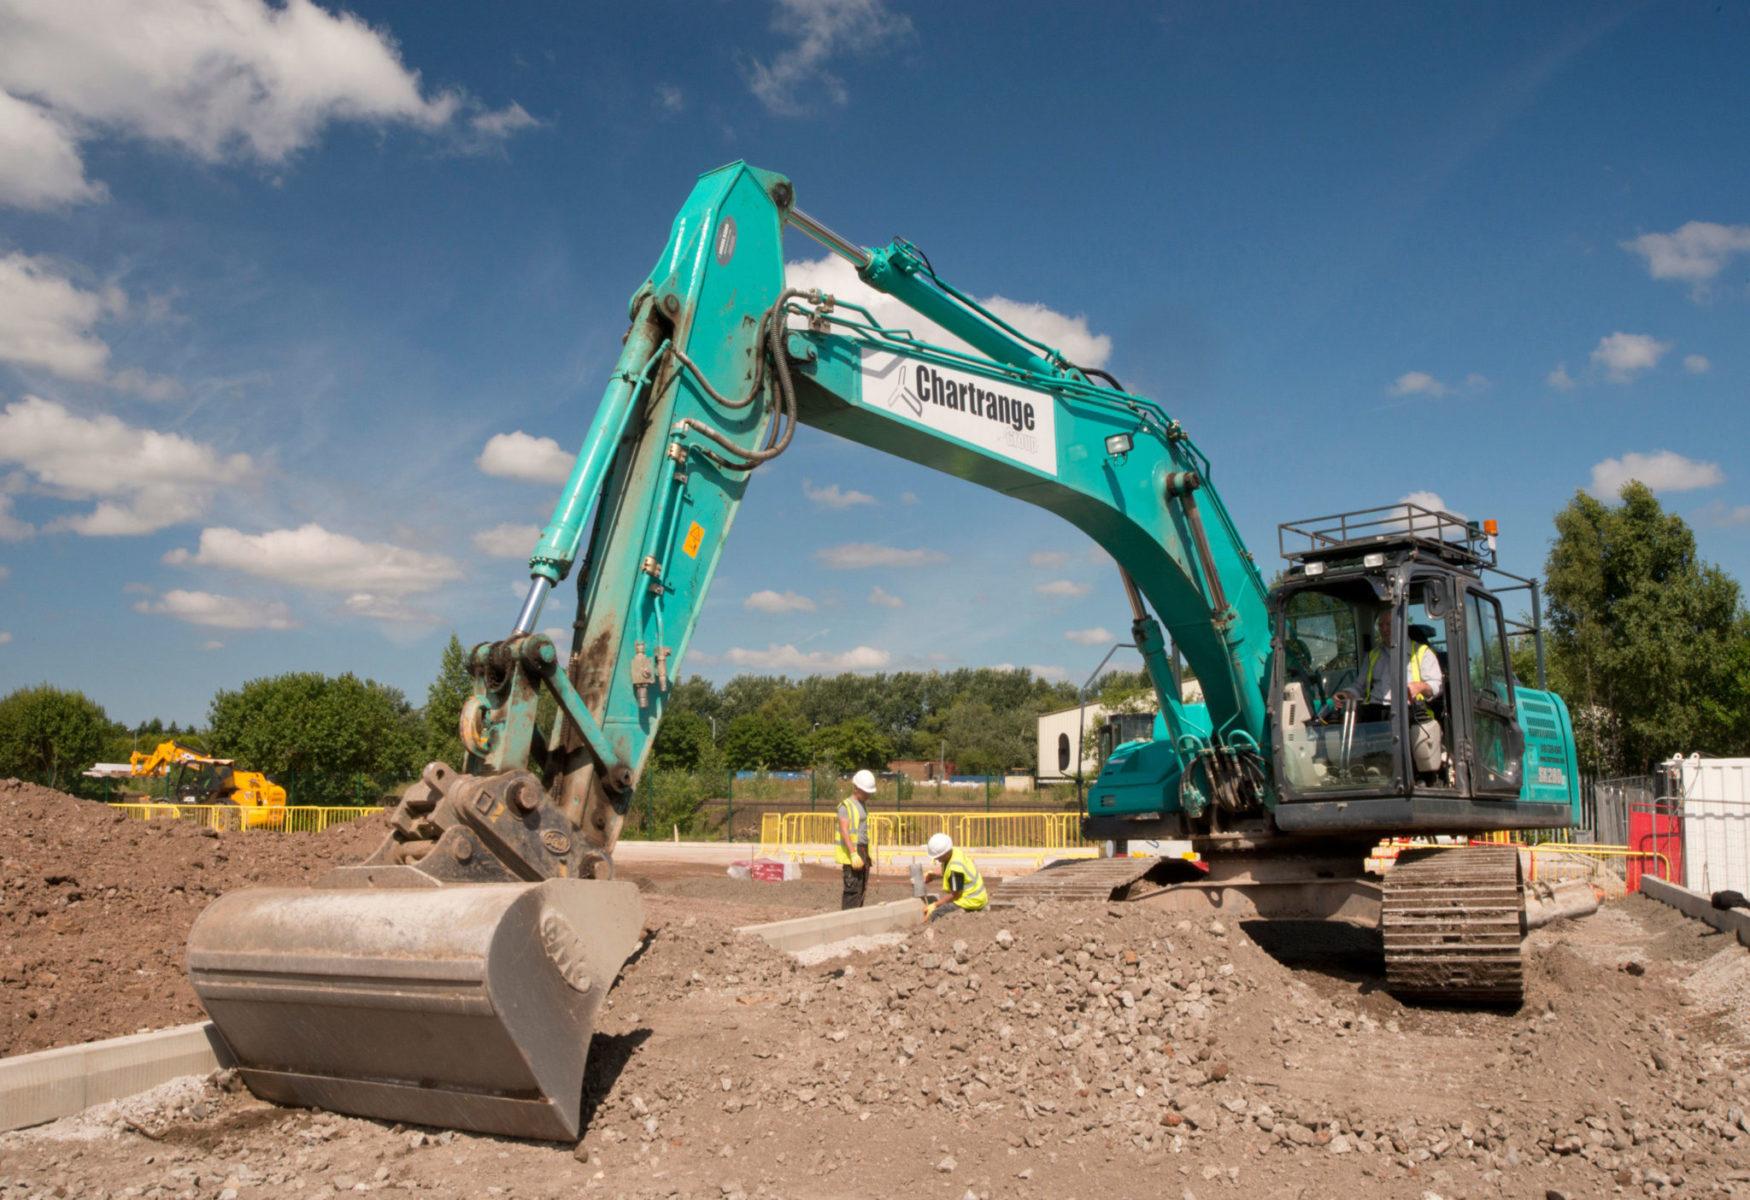 Chartrange Excavator